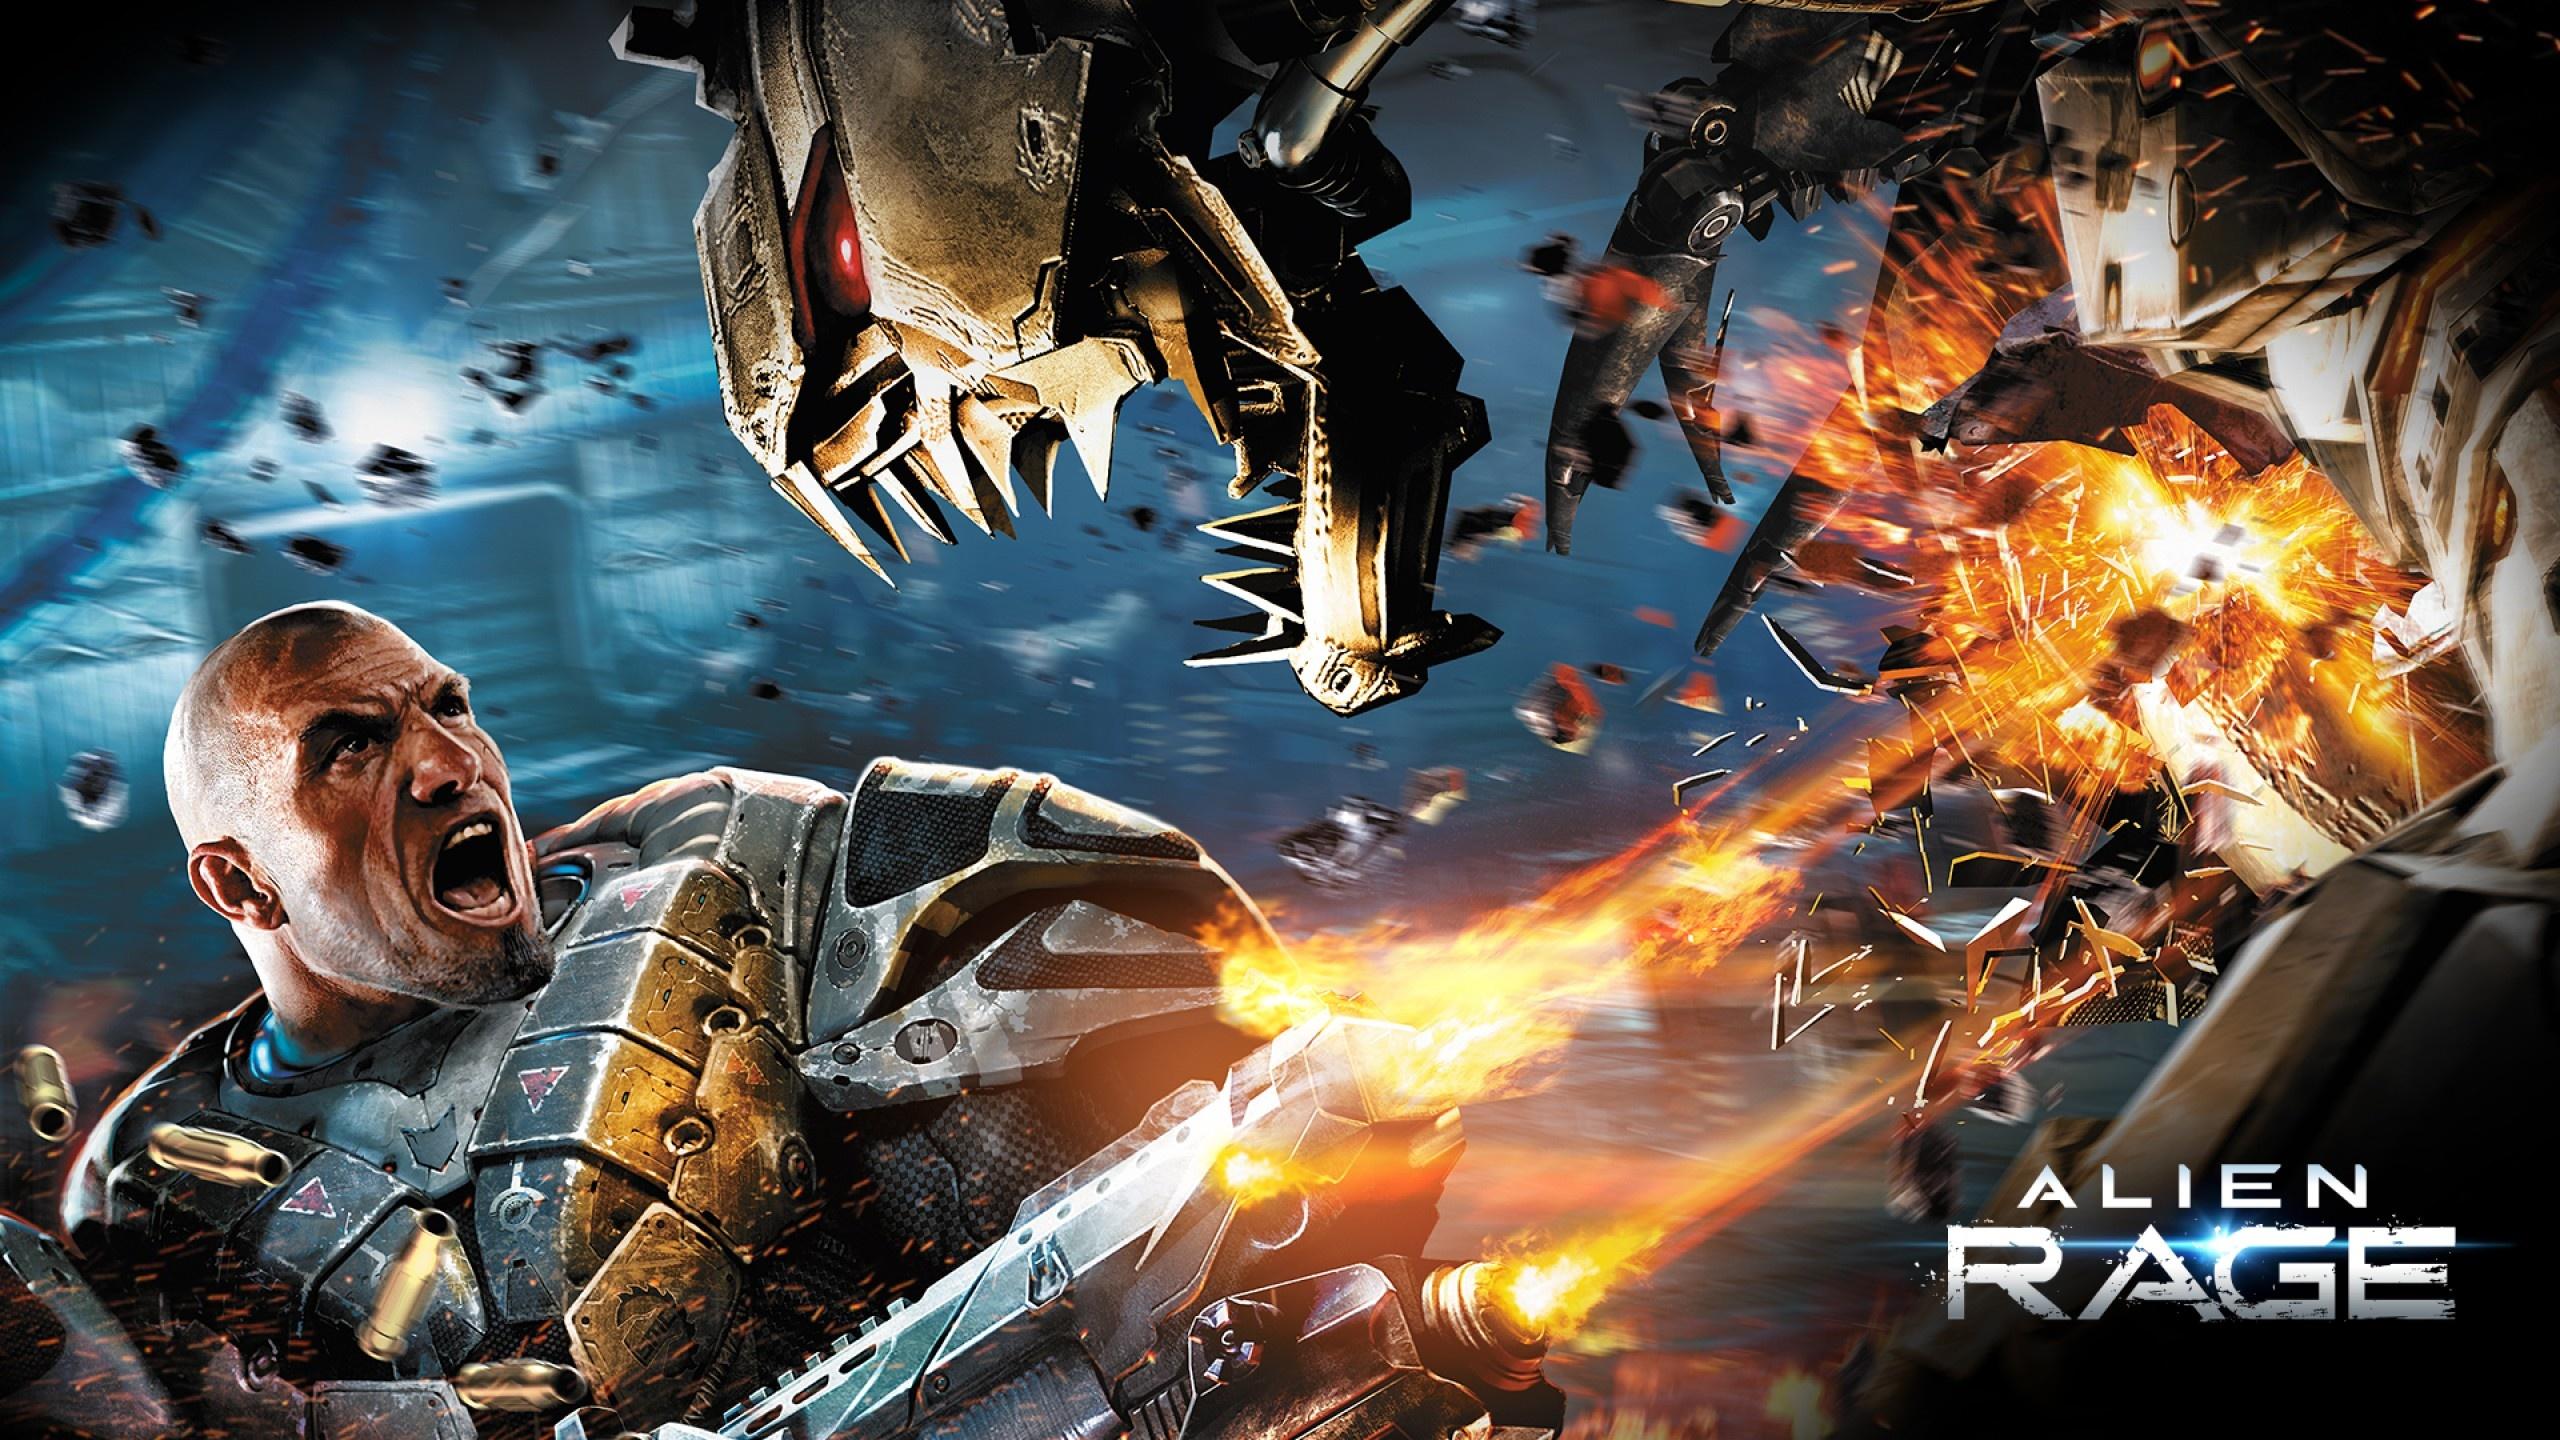 Alien Rage Game Wallpapers   2560x1440   1210133 2560x1440